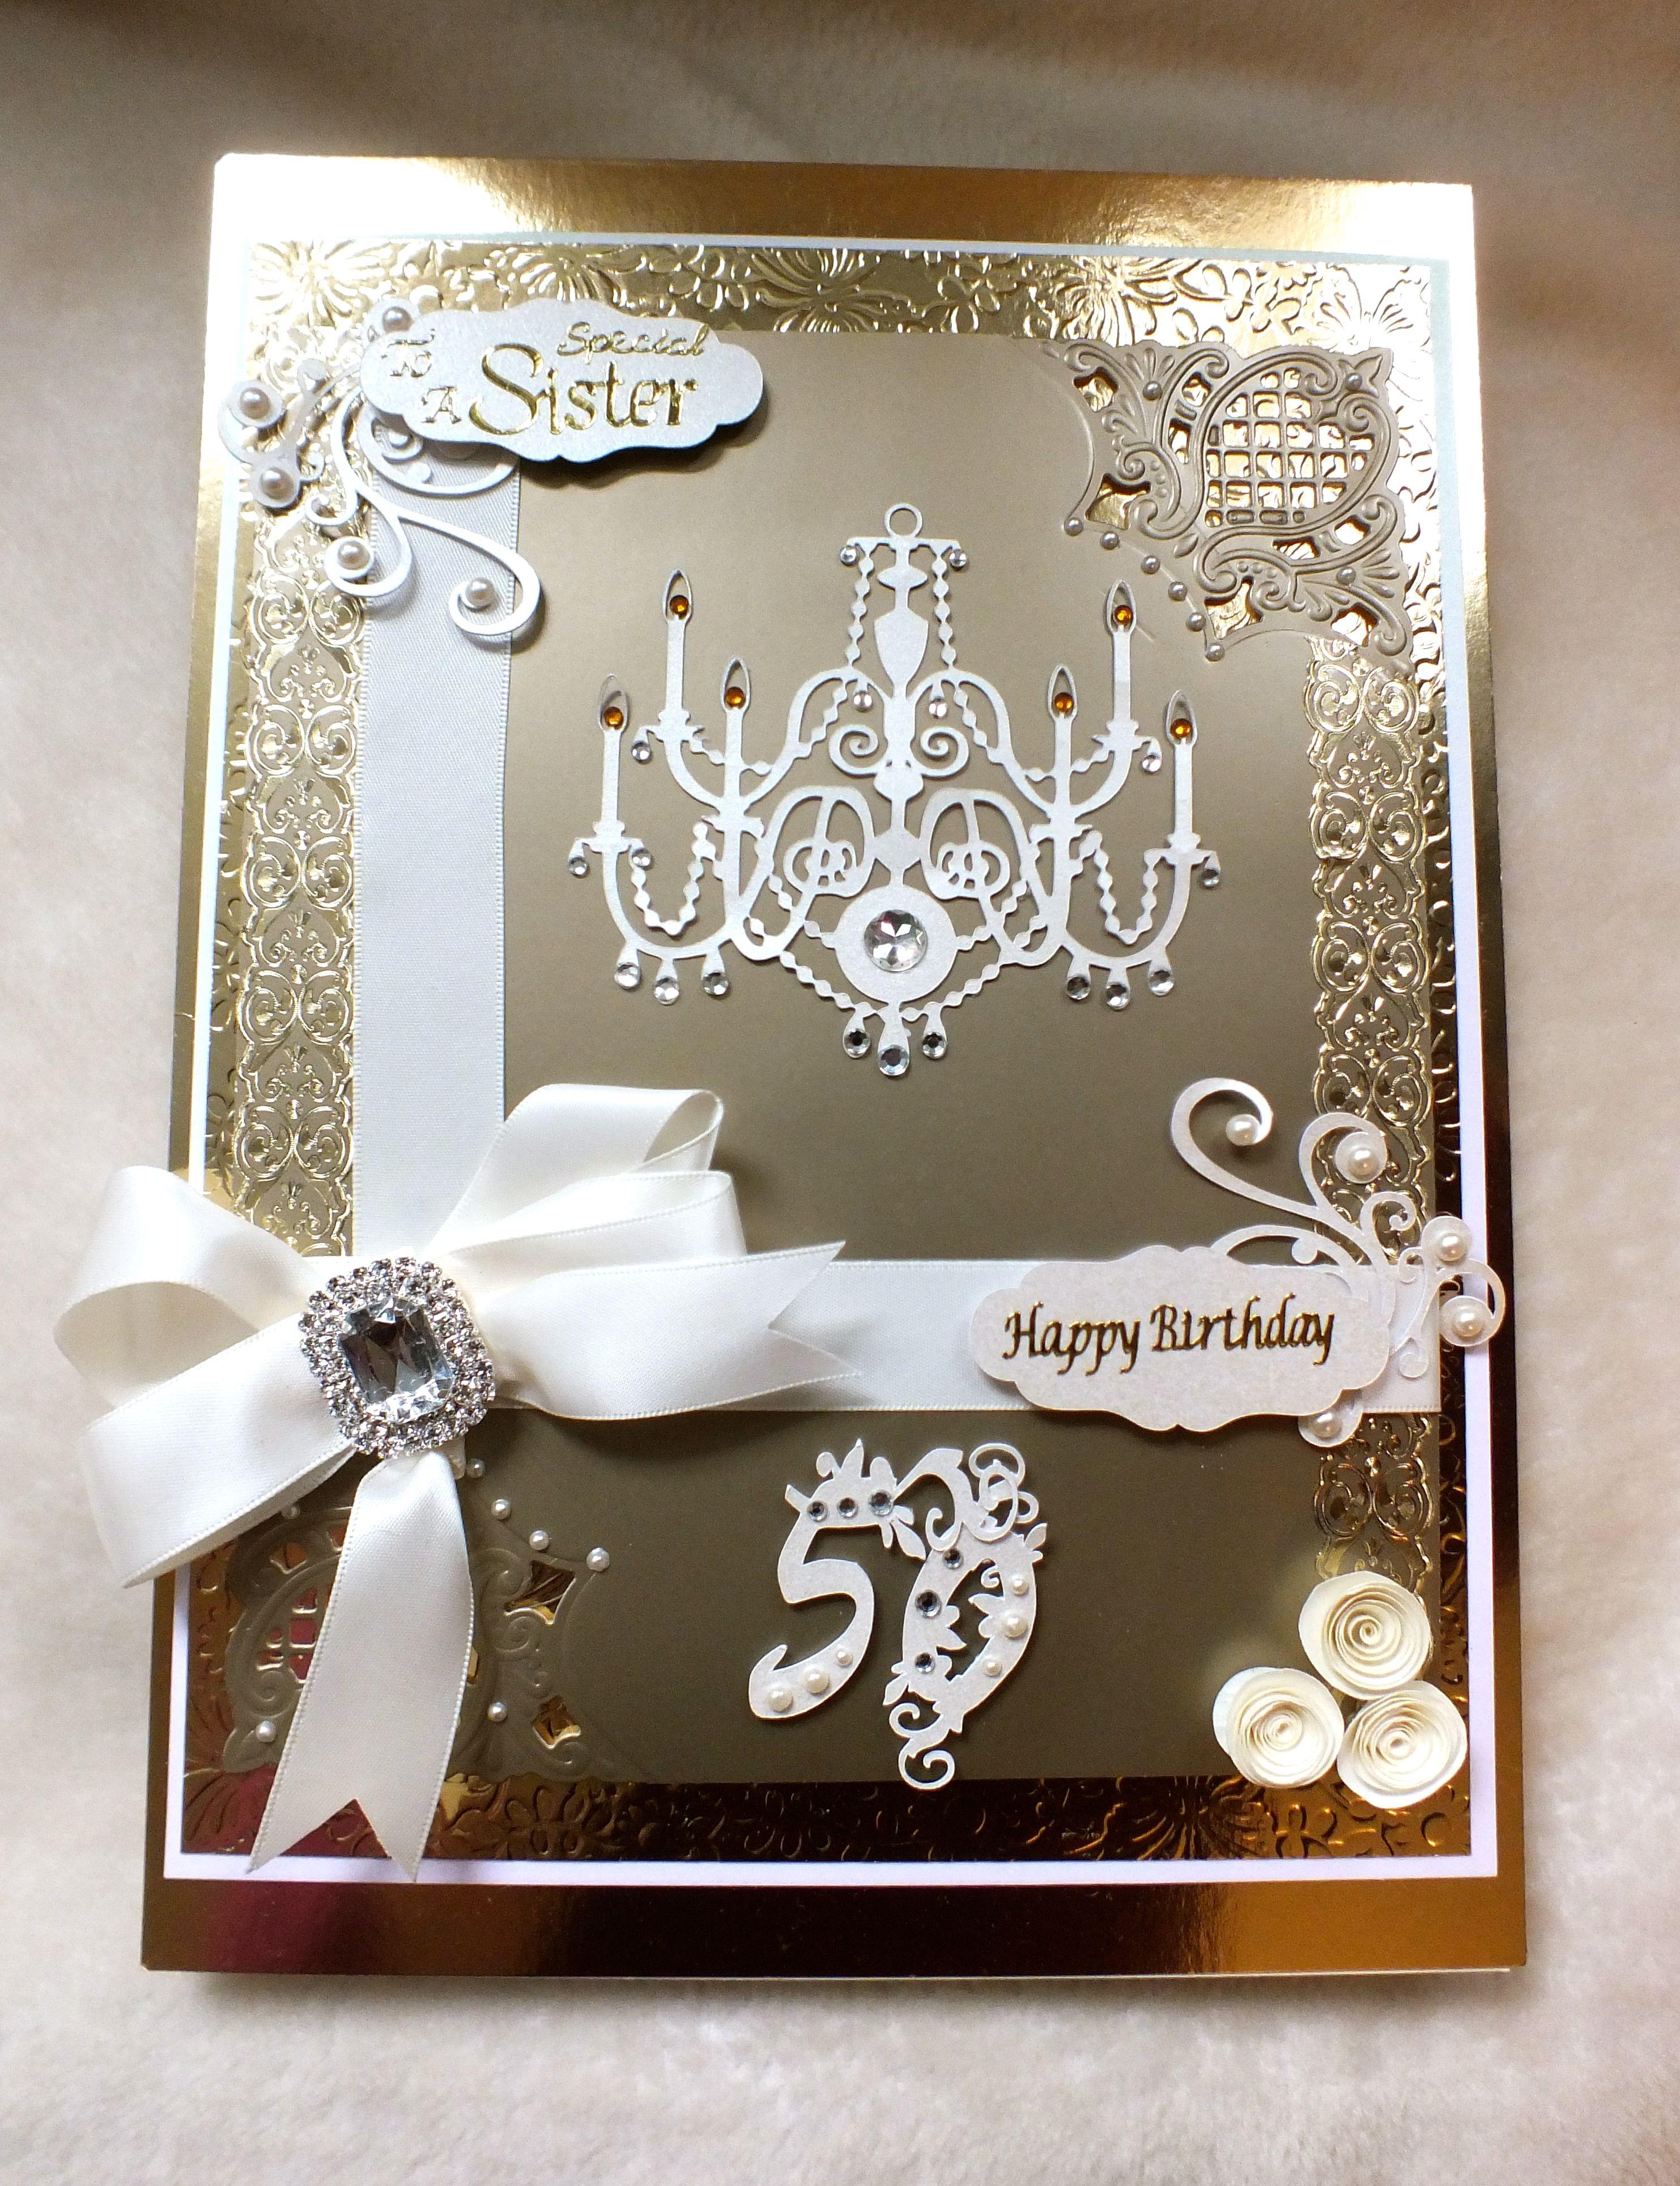 Bespoke luxury handmade 50th birthday card handmade cards bespoke luxury handmade 50th birthday card kristyandbryce Images